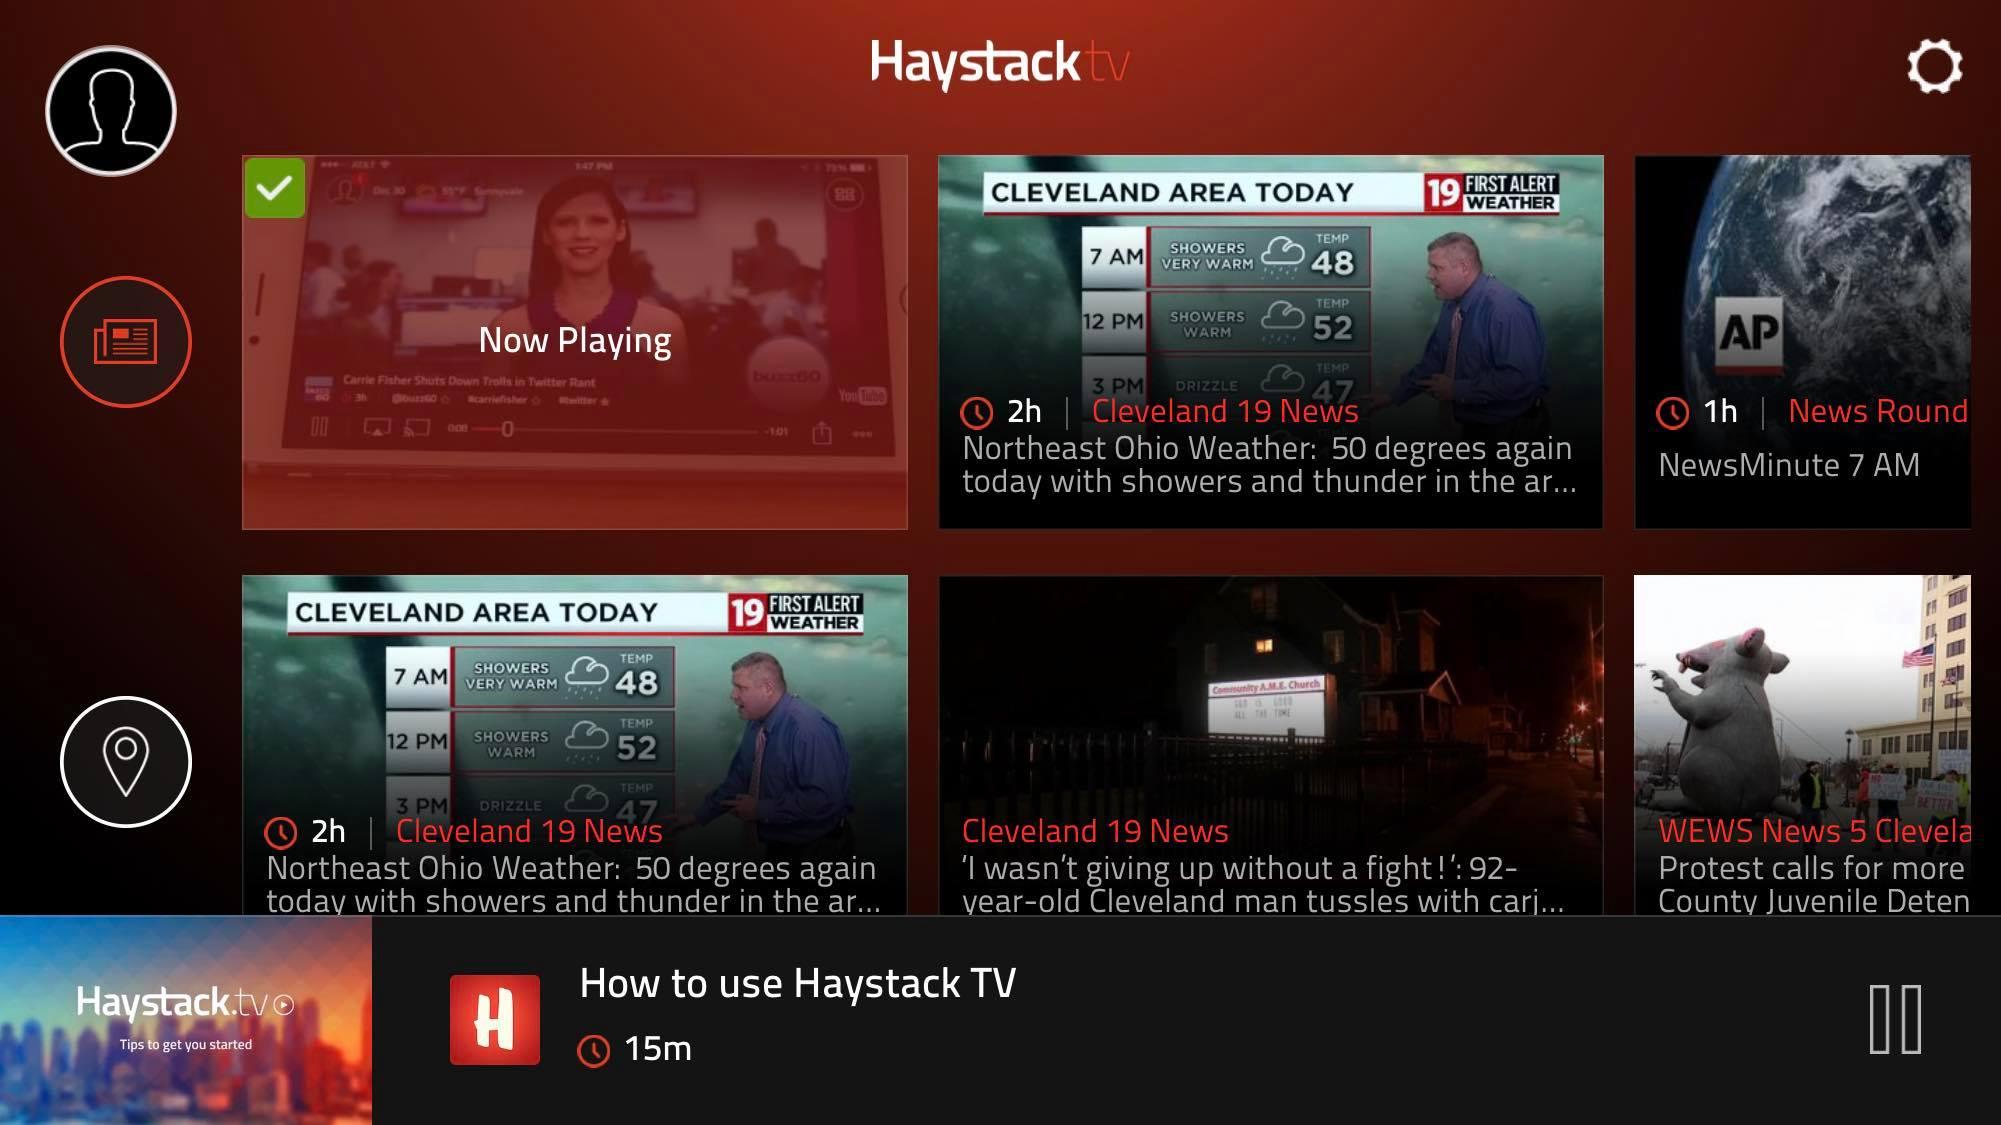 Step 14 - Haystack TV iOS Device Installation Guide